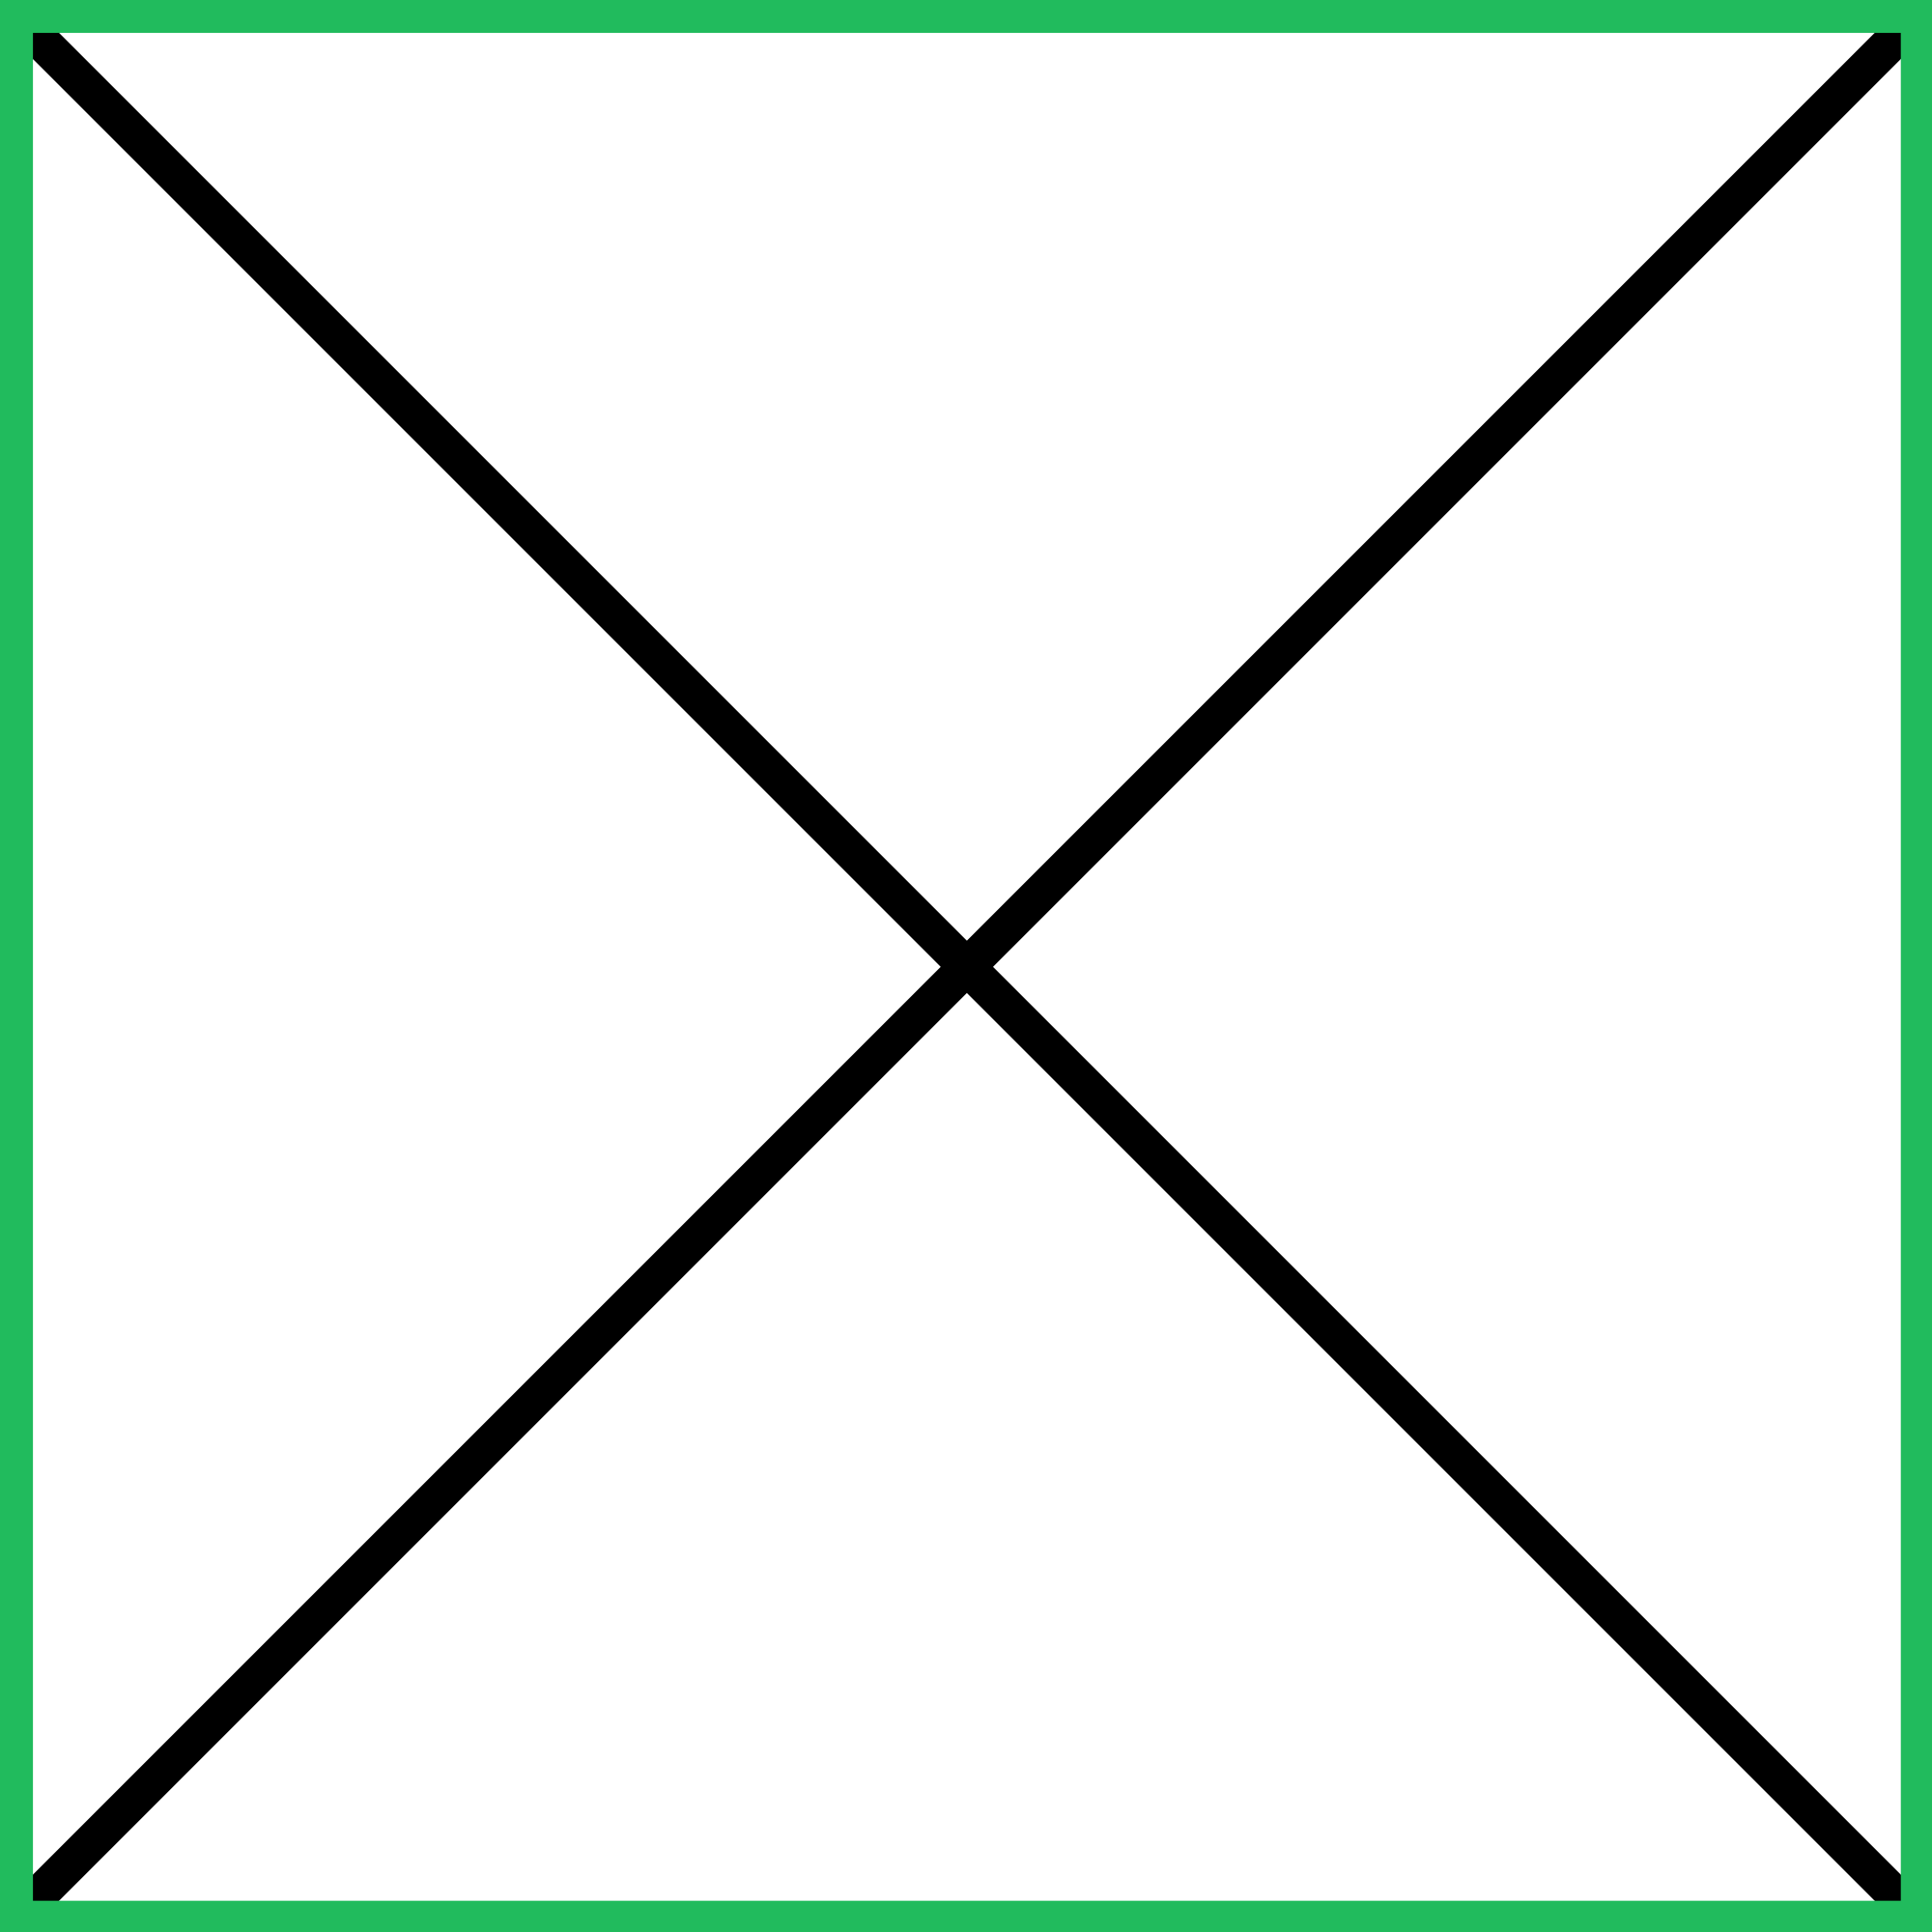 File nato map symbol. Thumb clipart neutral